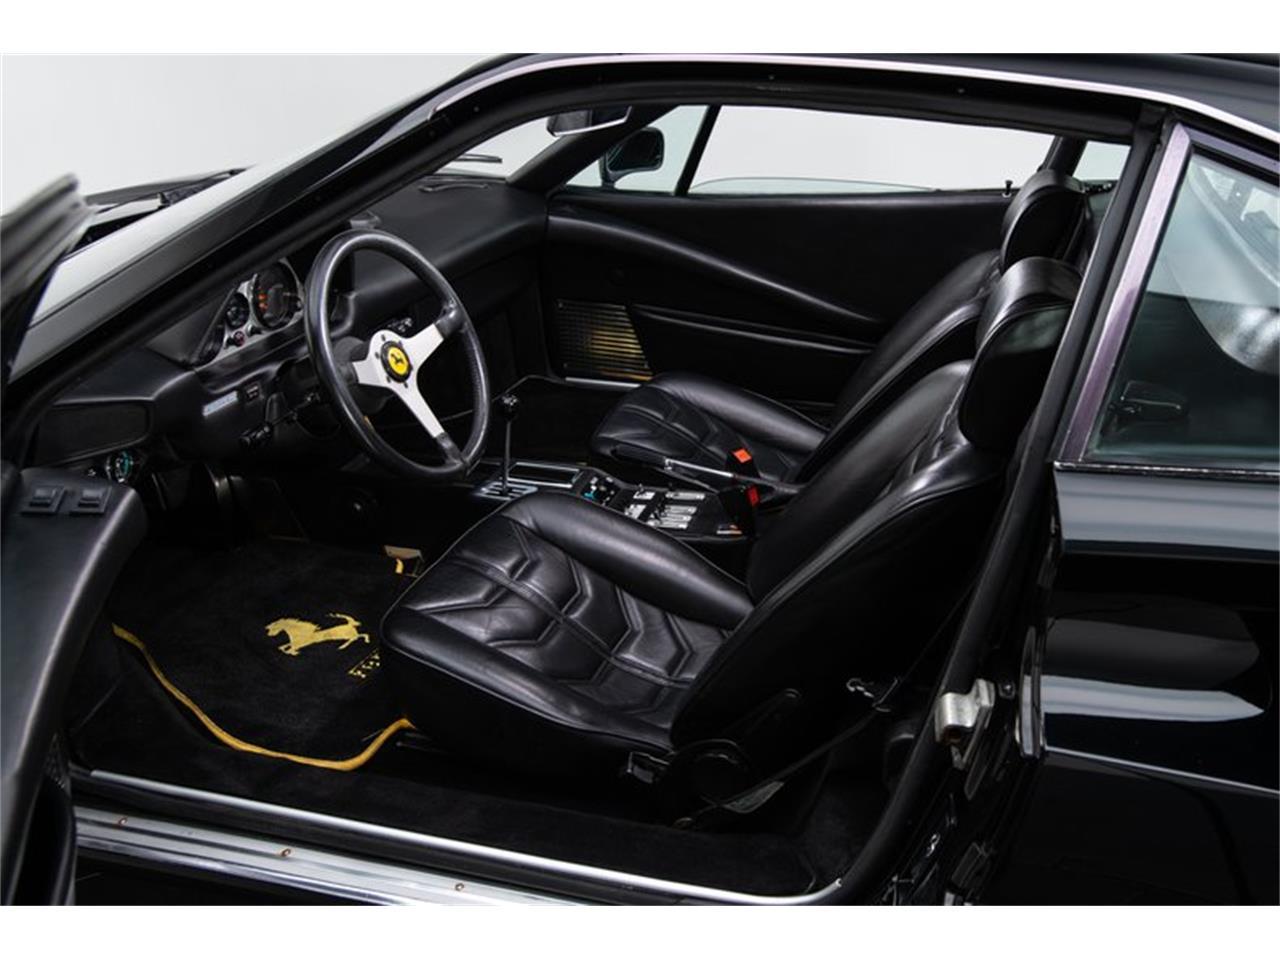 Large Picture of 1978 Ferrari 308 located in Charlotte North Carolina - $119,900.00 - PT1K